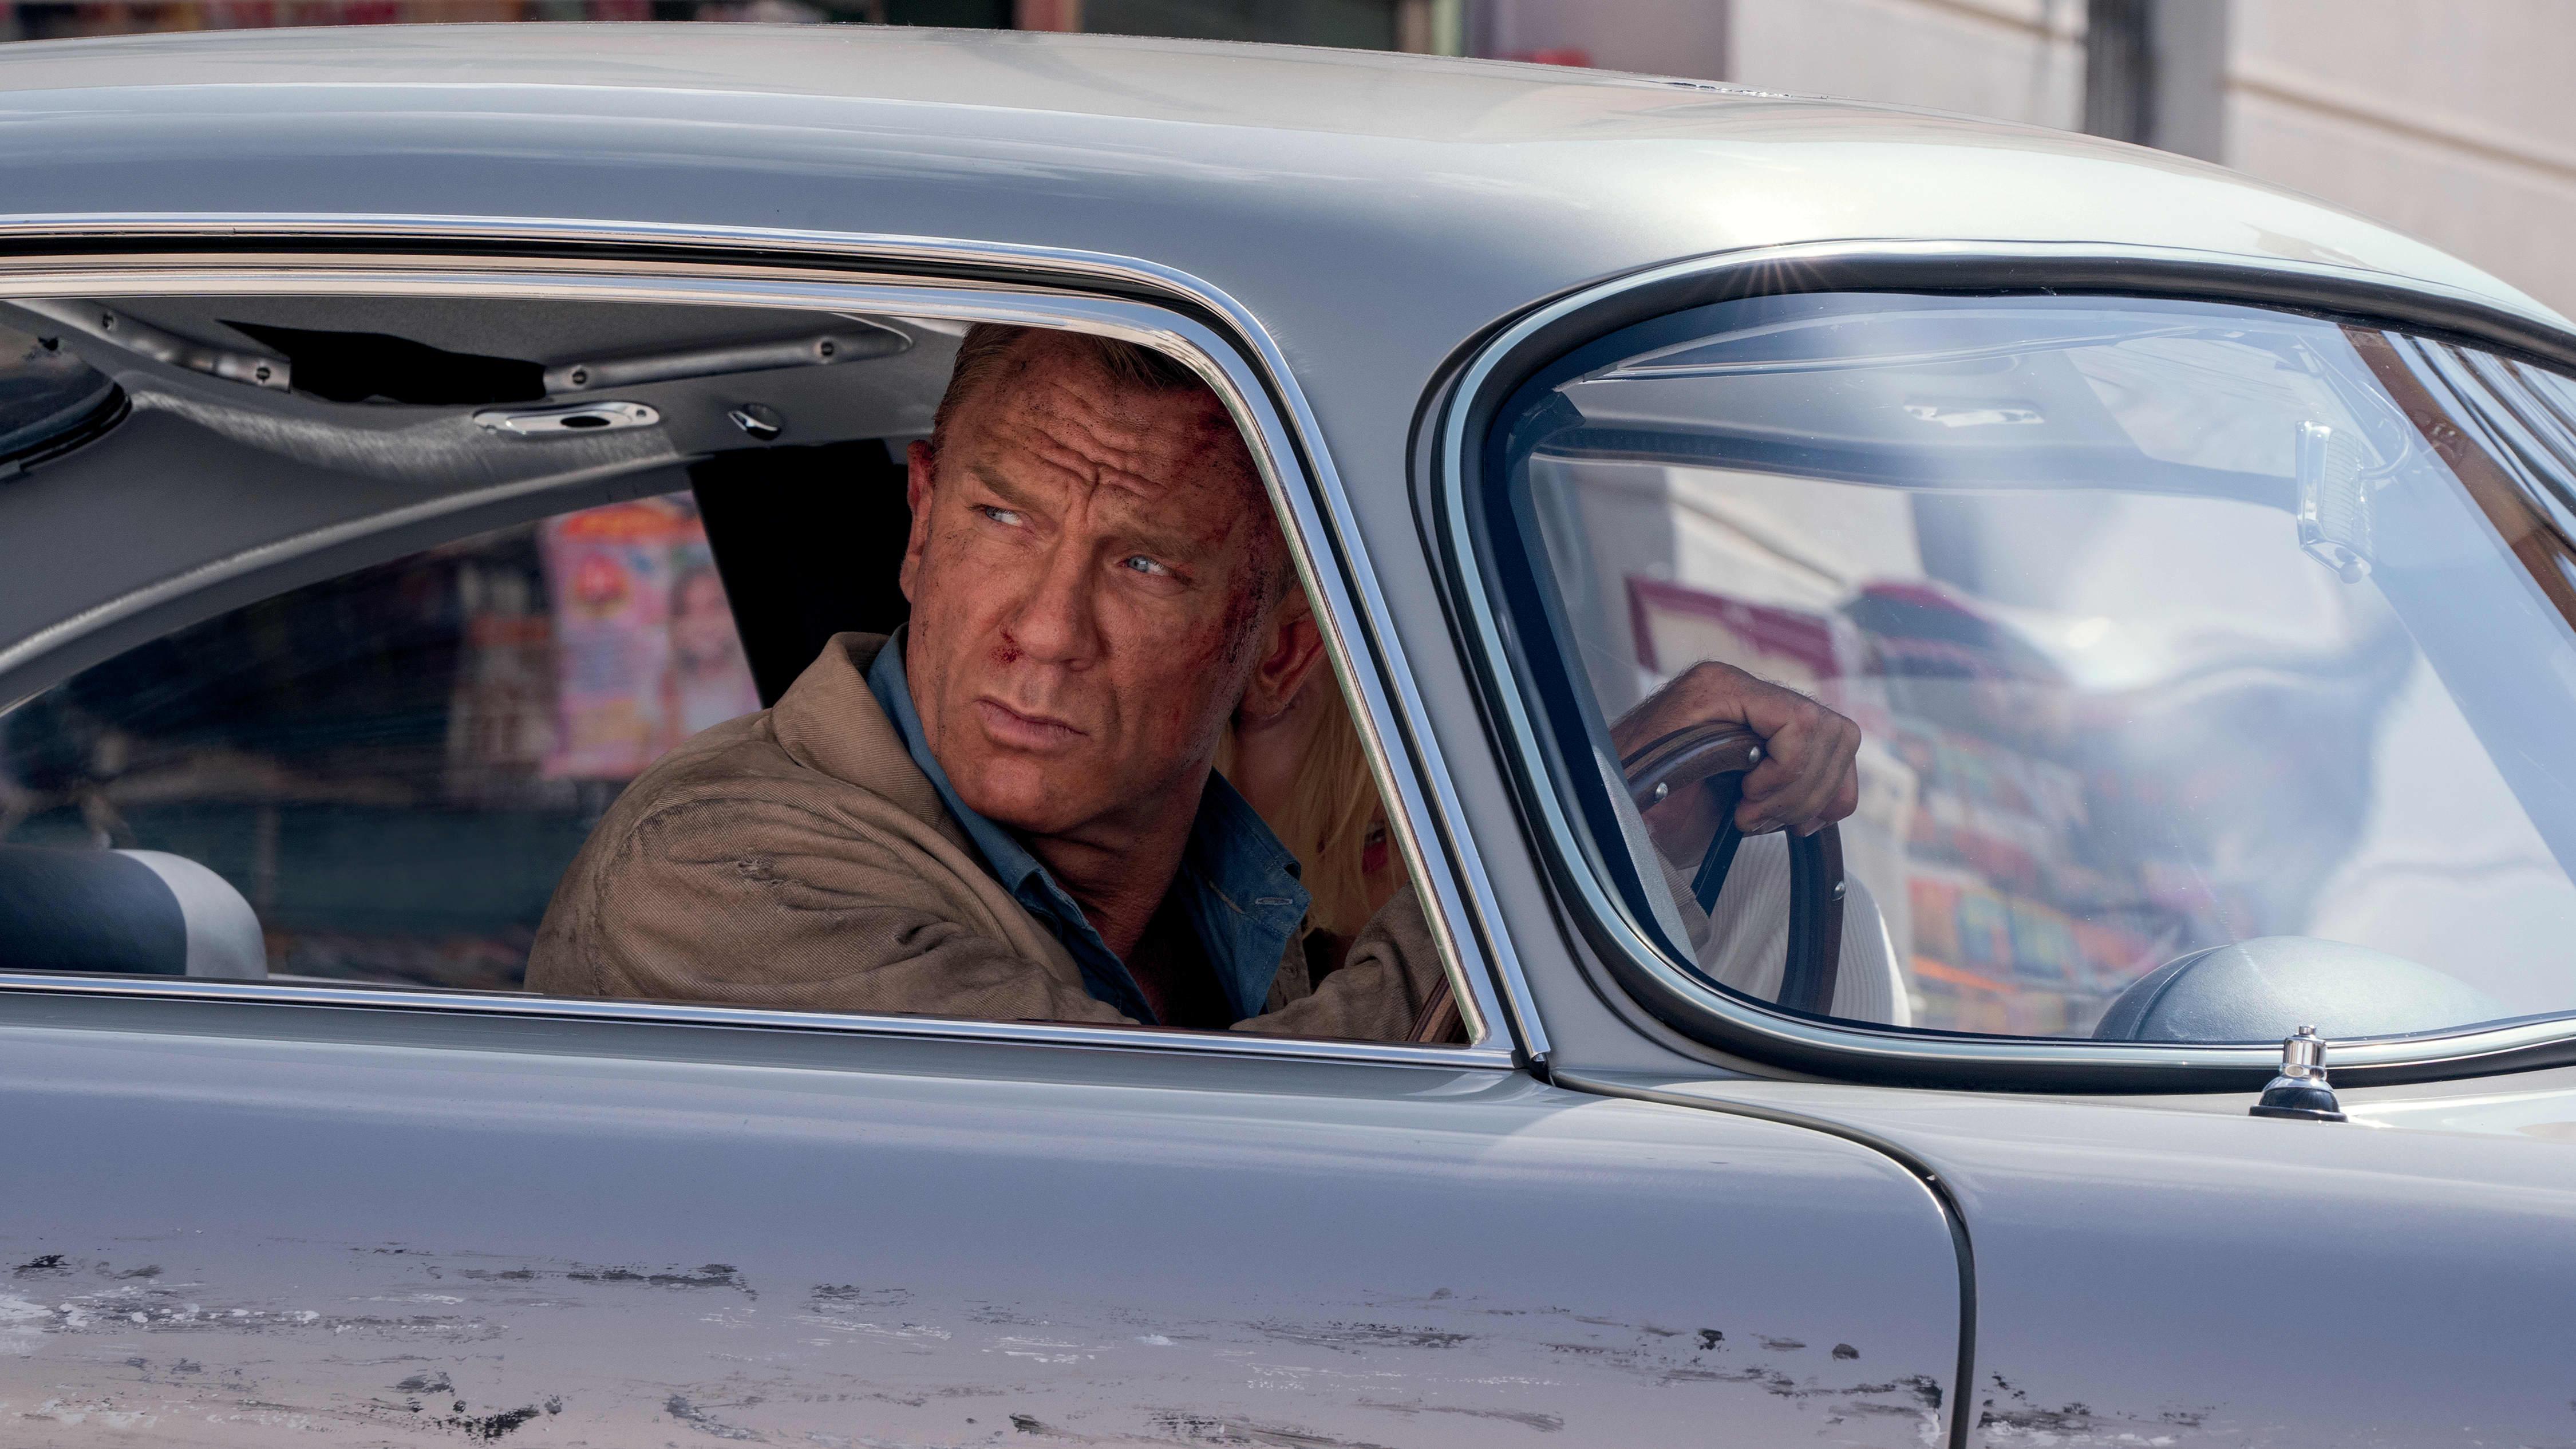 Daniel Craig naarmuuntuneessa Aston Martinissa.